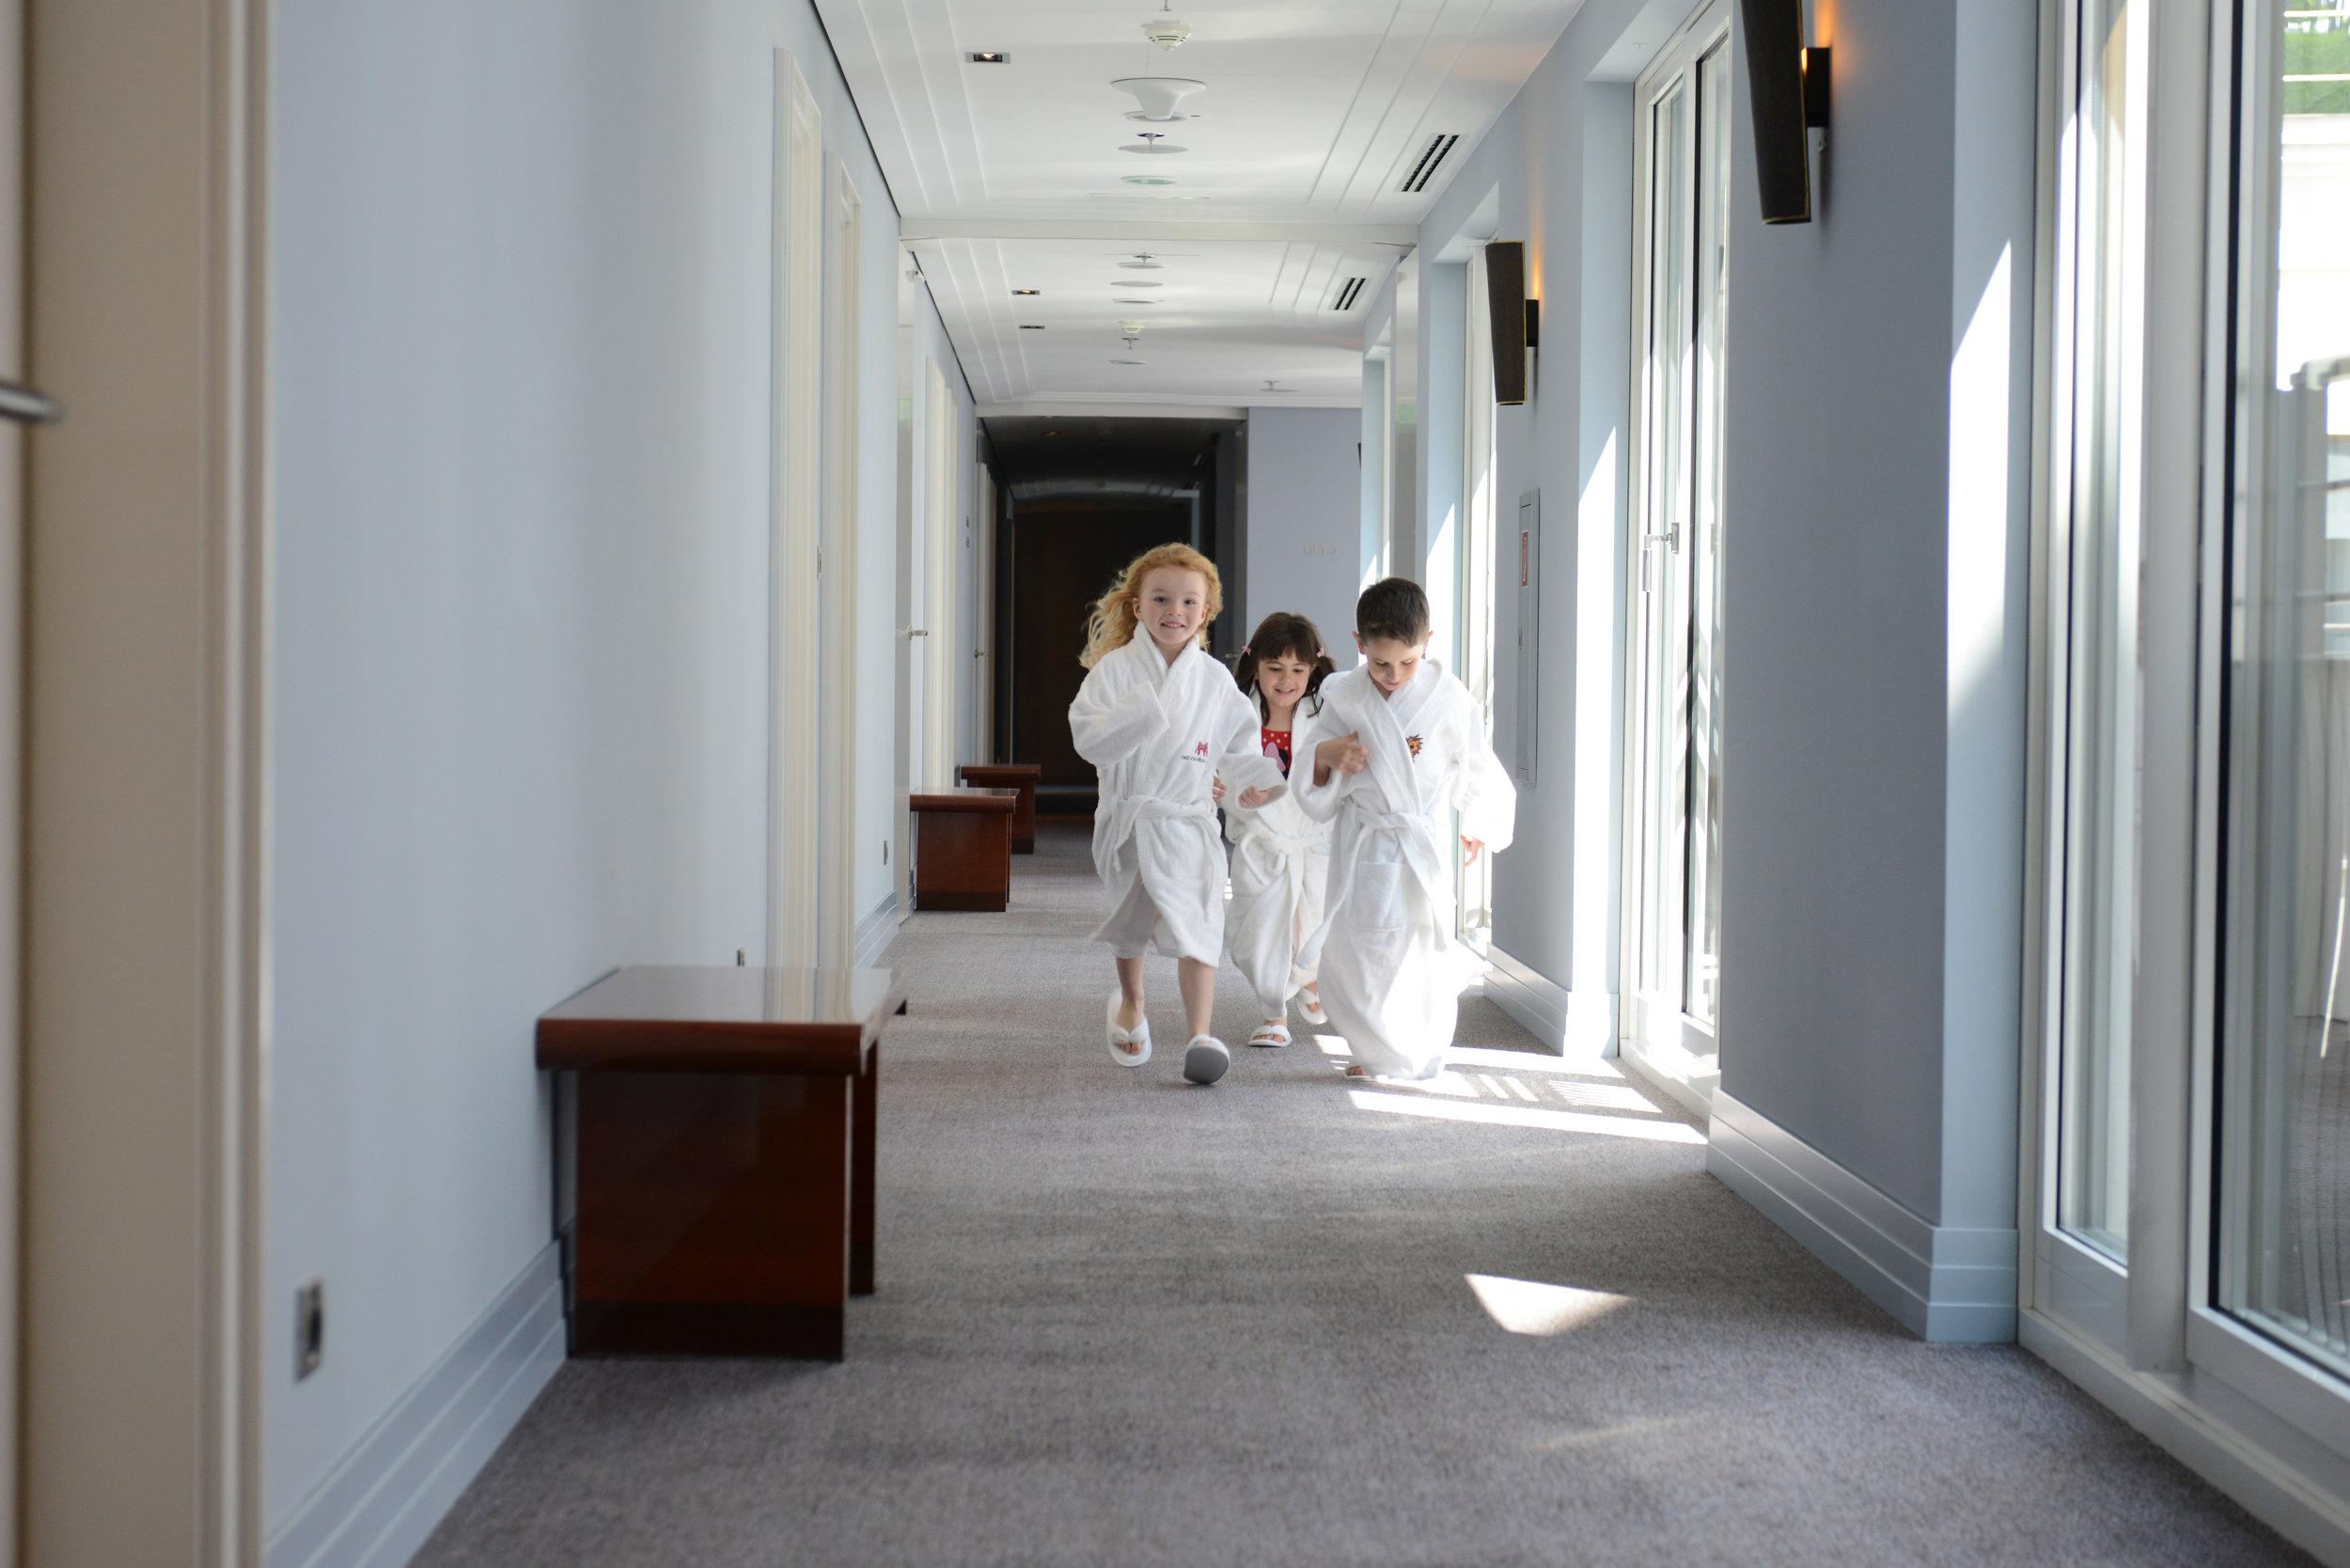 10 RFH Children at The Charles Hotel 6012 AH May 13.JPG